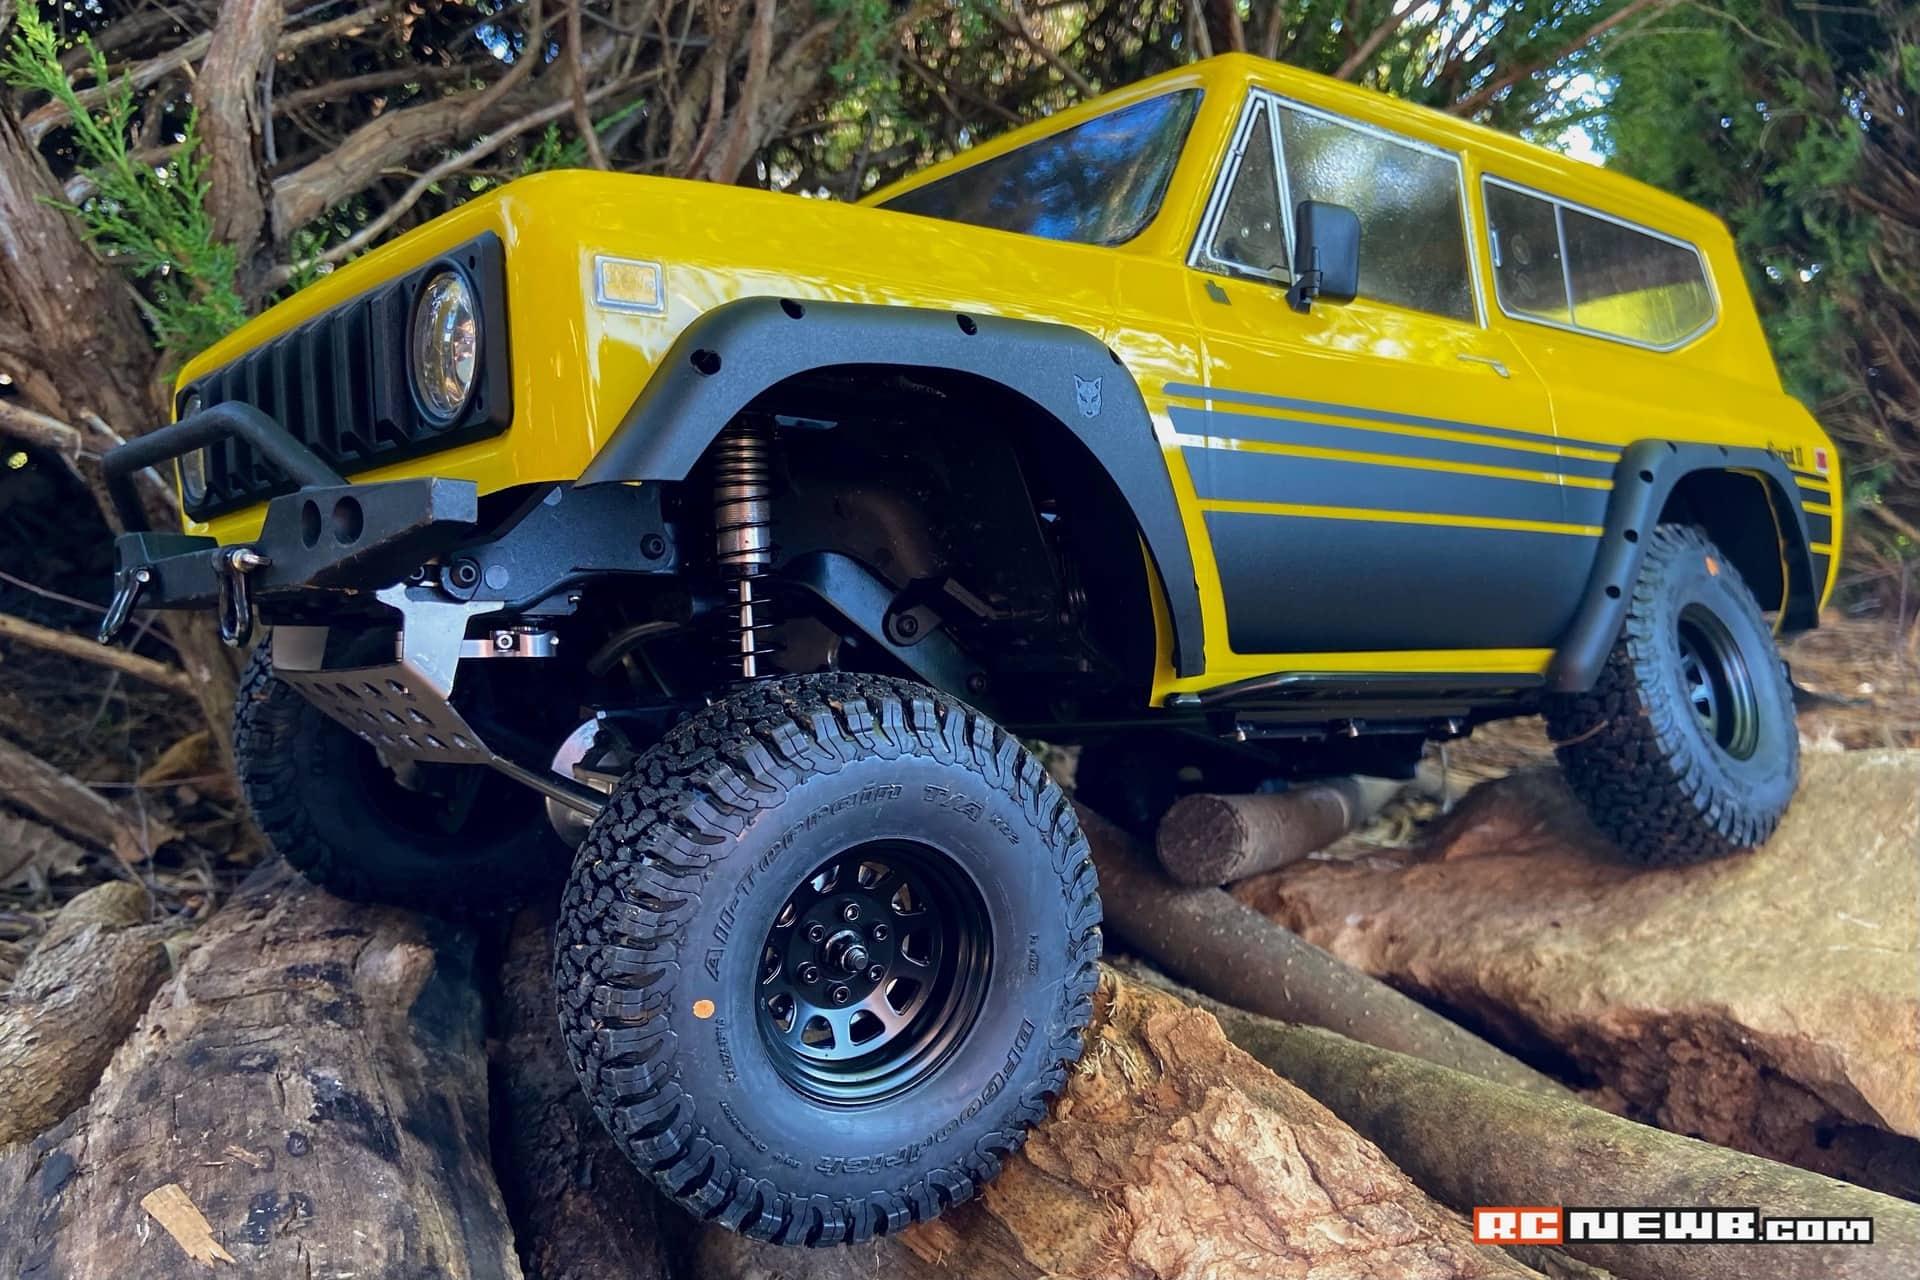 Review: Pro-Line BFGoodrich All-Terrain KO2 1.9″ G8 Rock Terrain Truck Tires